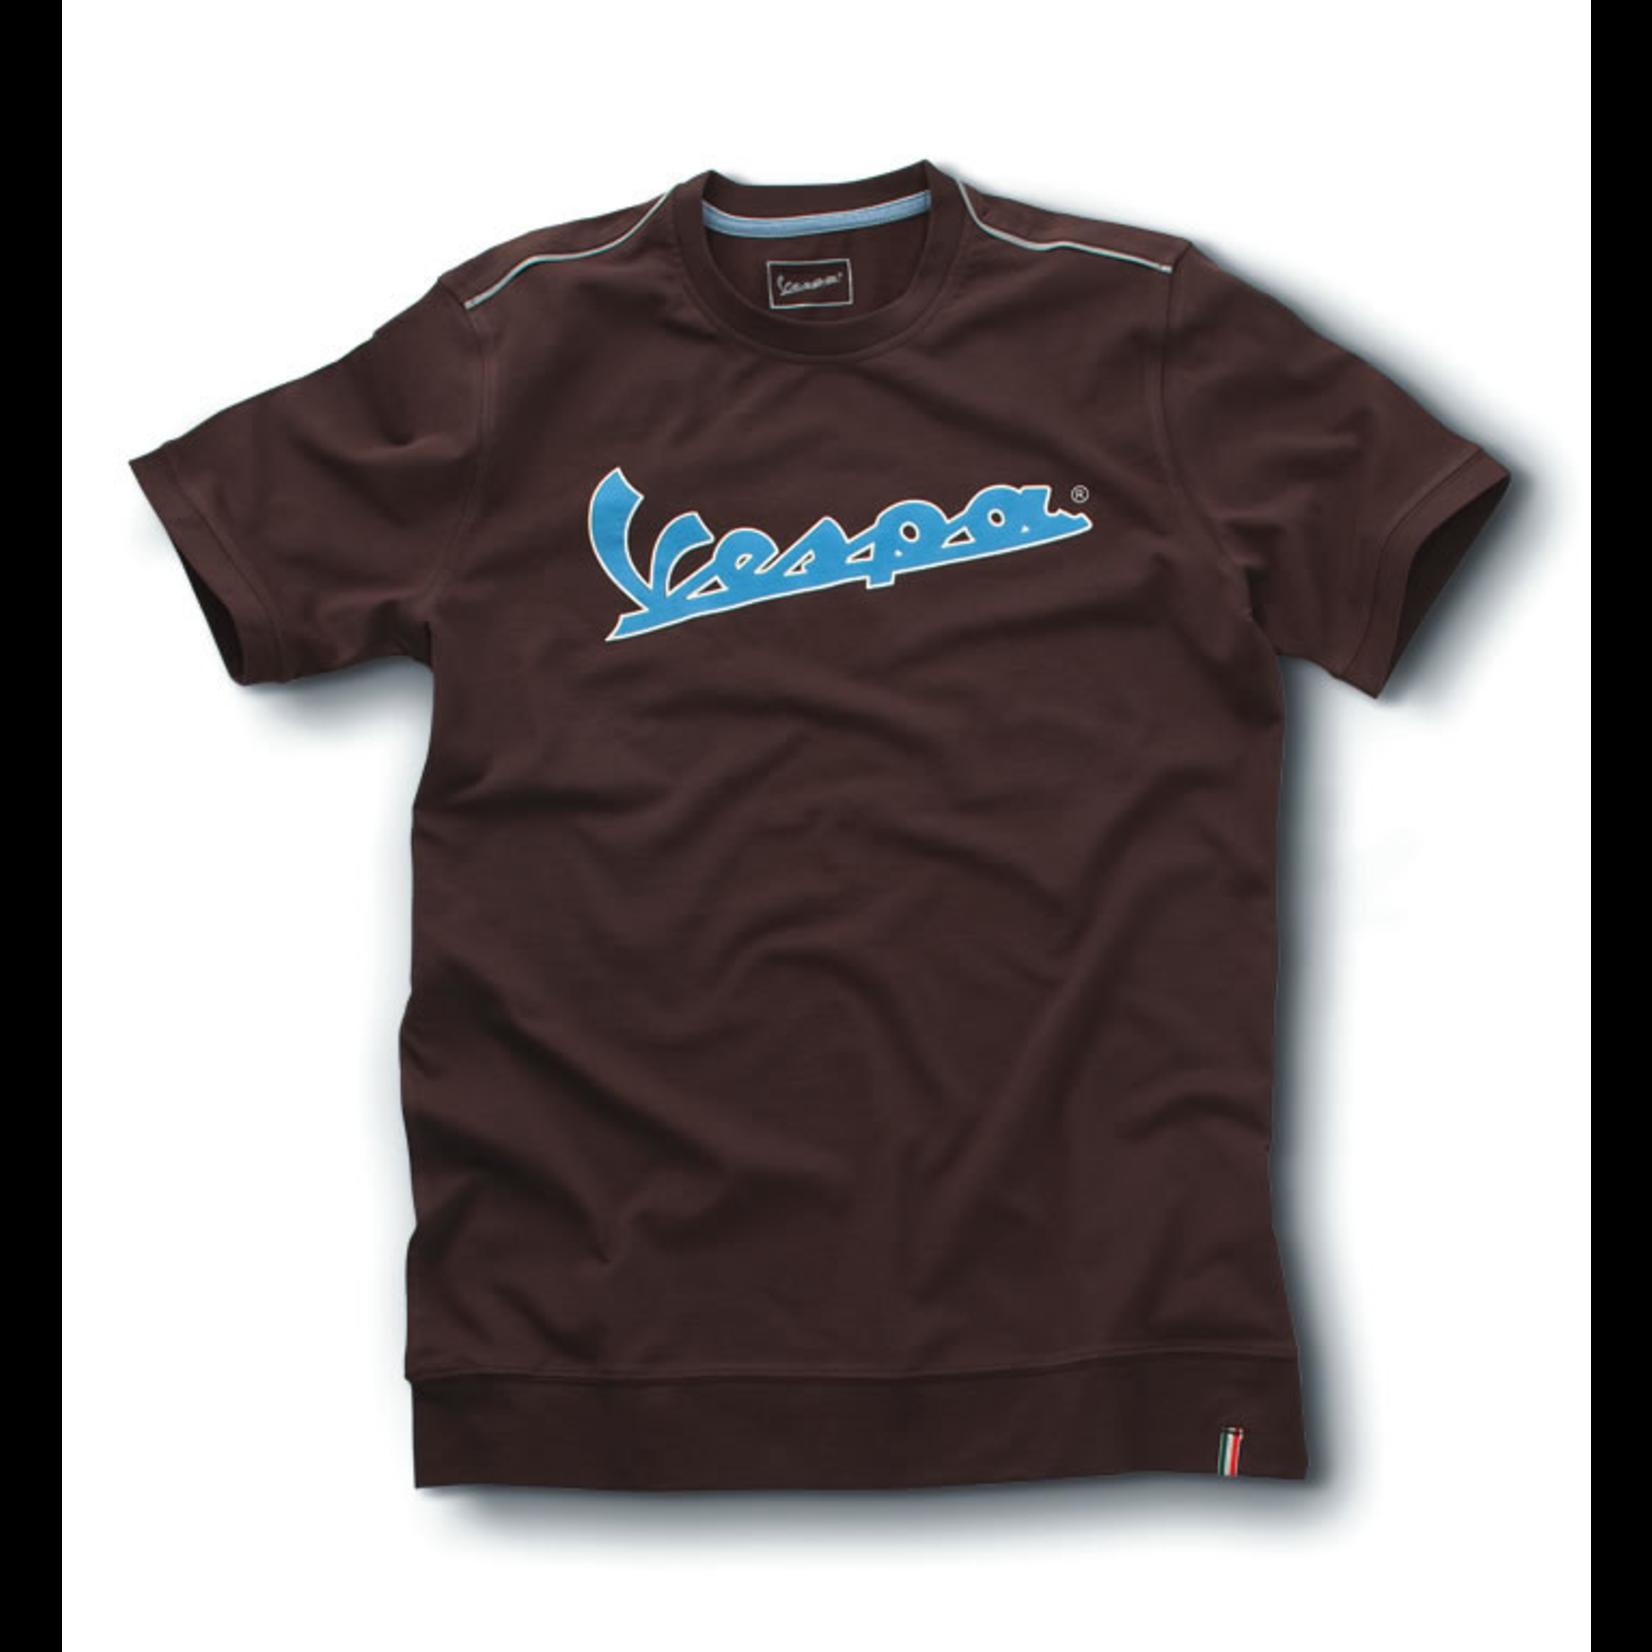 Apparel T-Shirt, Men's Vespa Brown LG